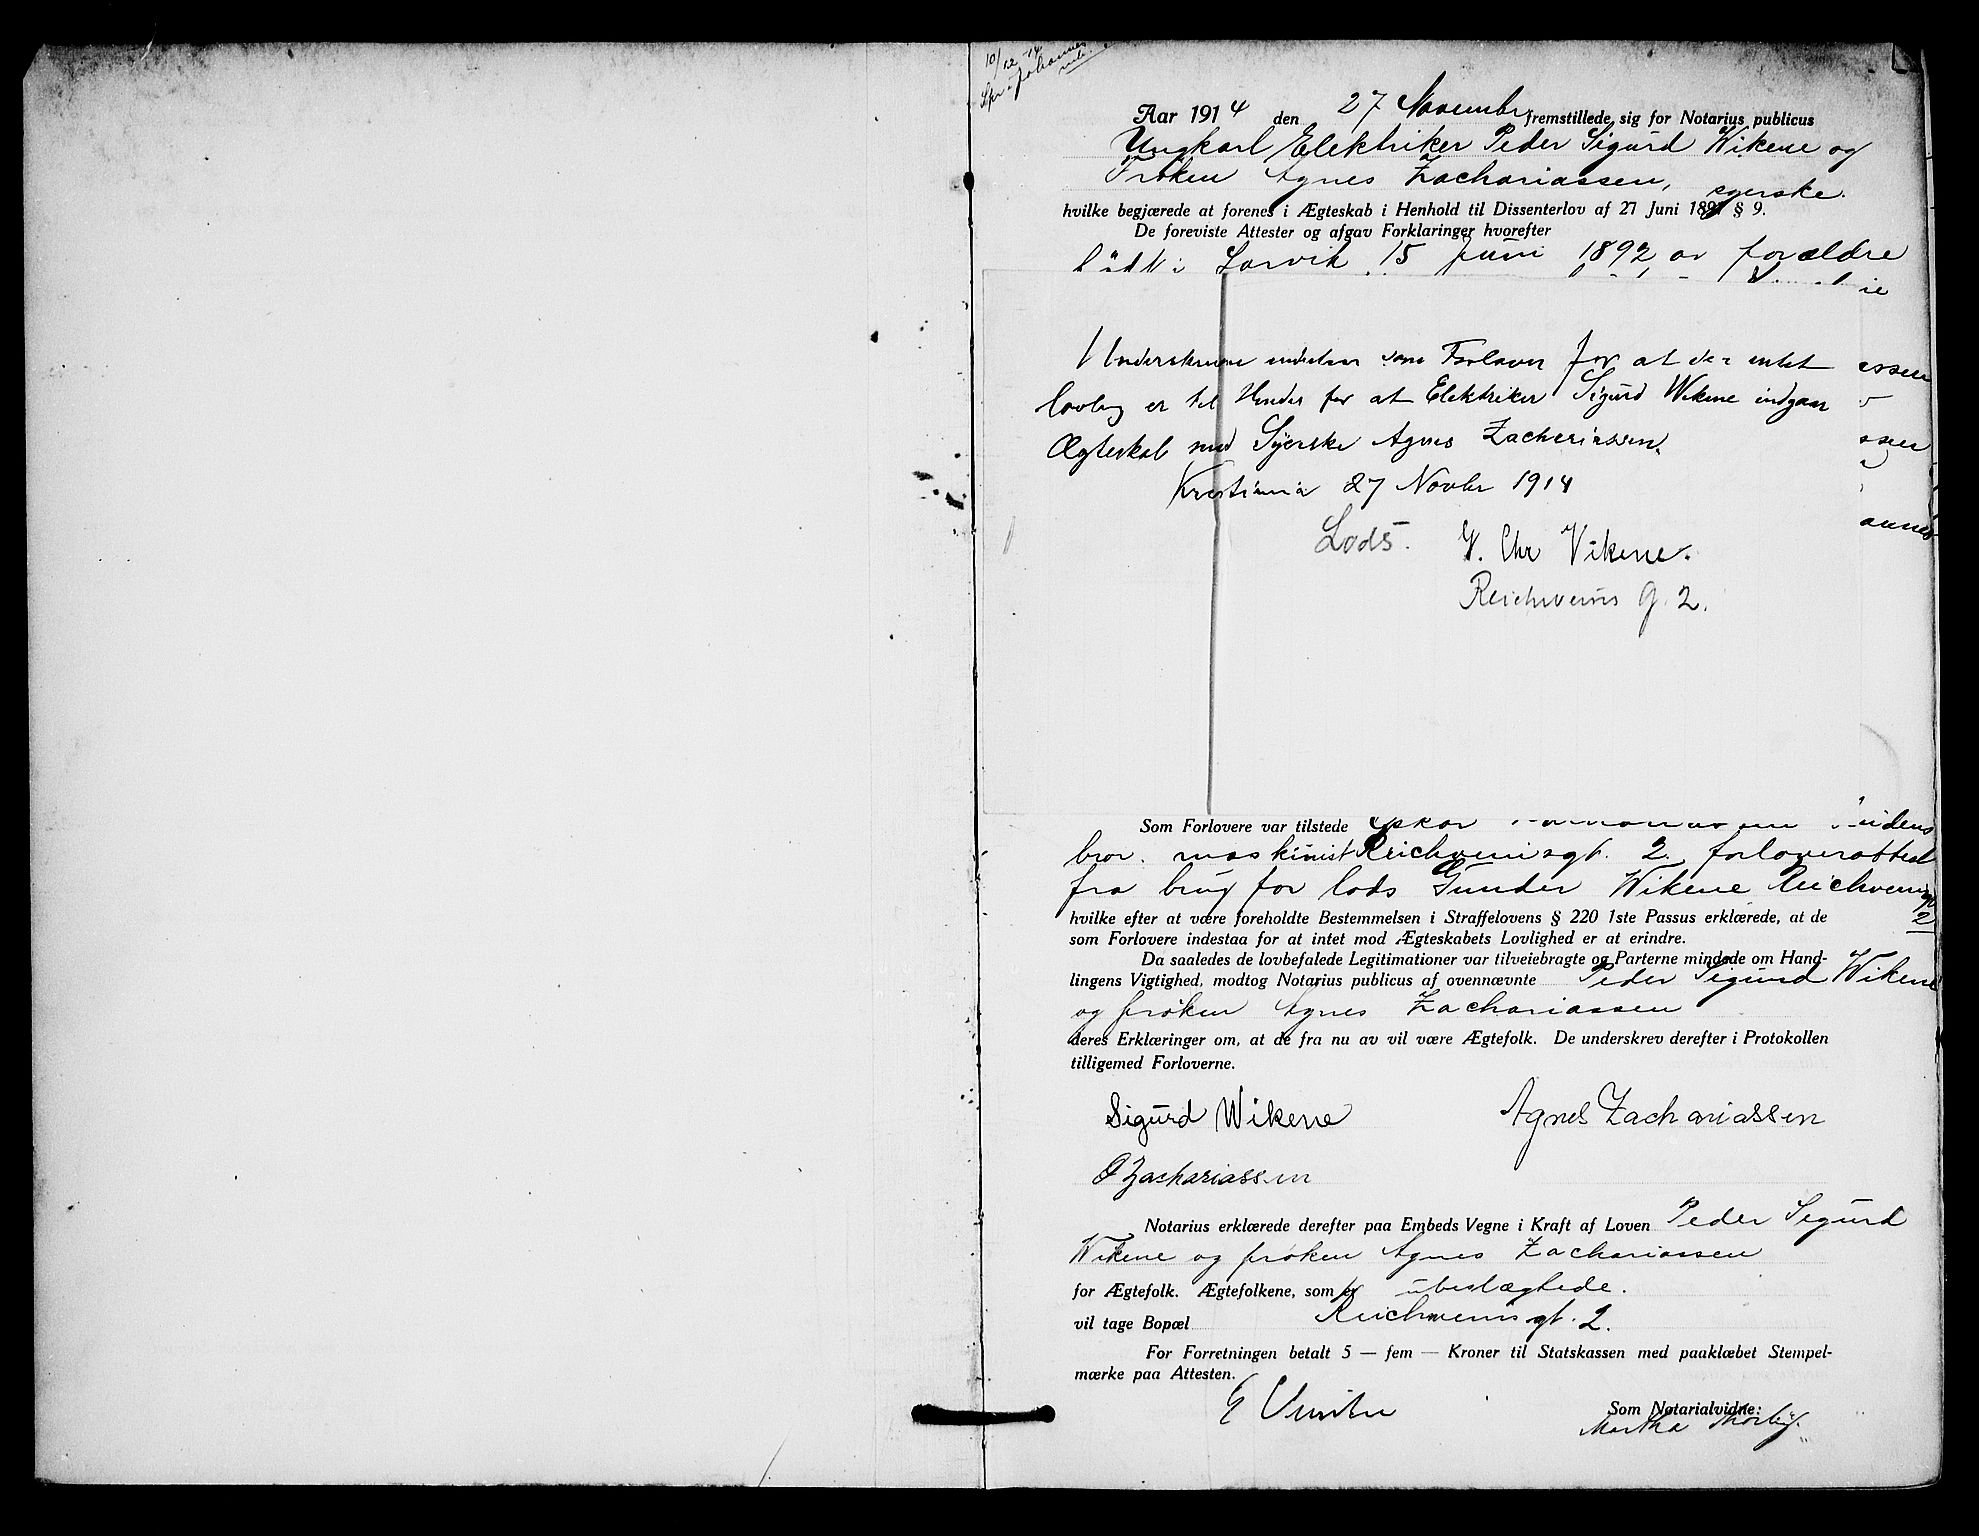 SAO, Oslo byfogd avd. I, L/Lb/Lbb/L0010: Notarialprotokoll, rekke II: Vigsler, 1914-1916, s. 1a